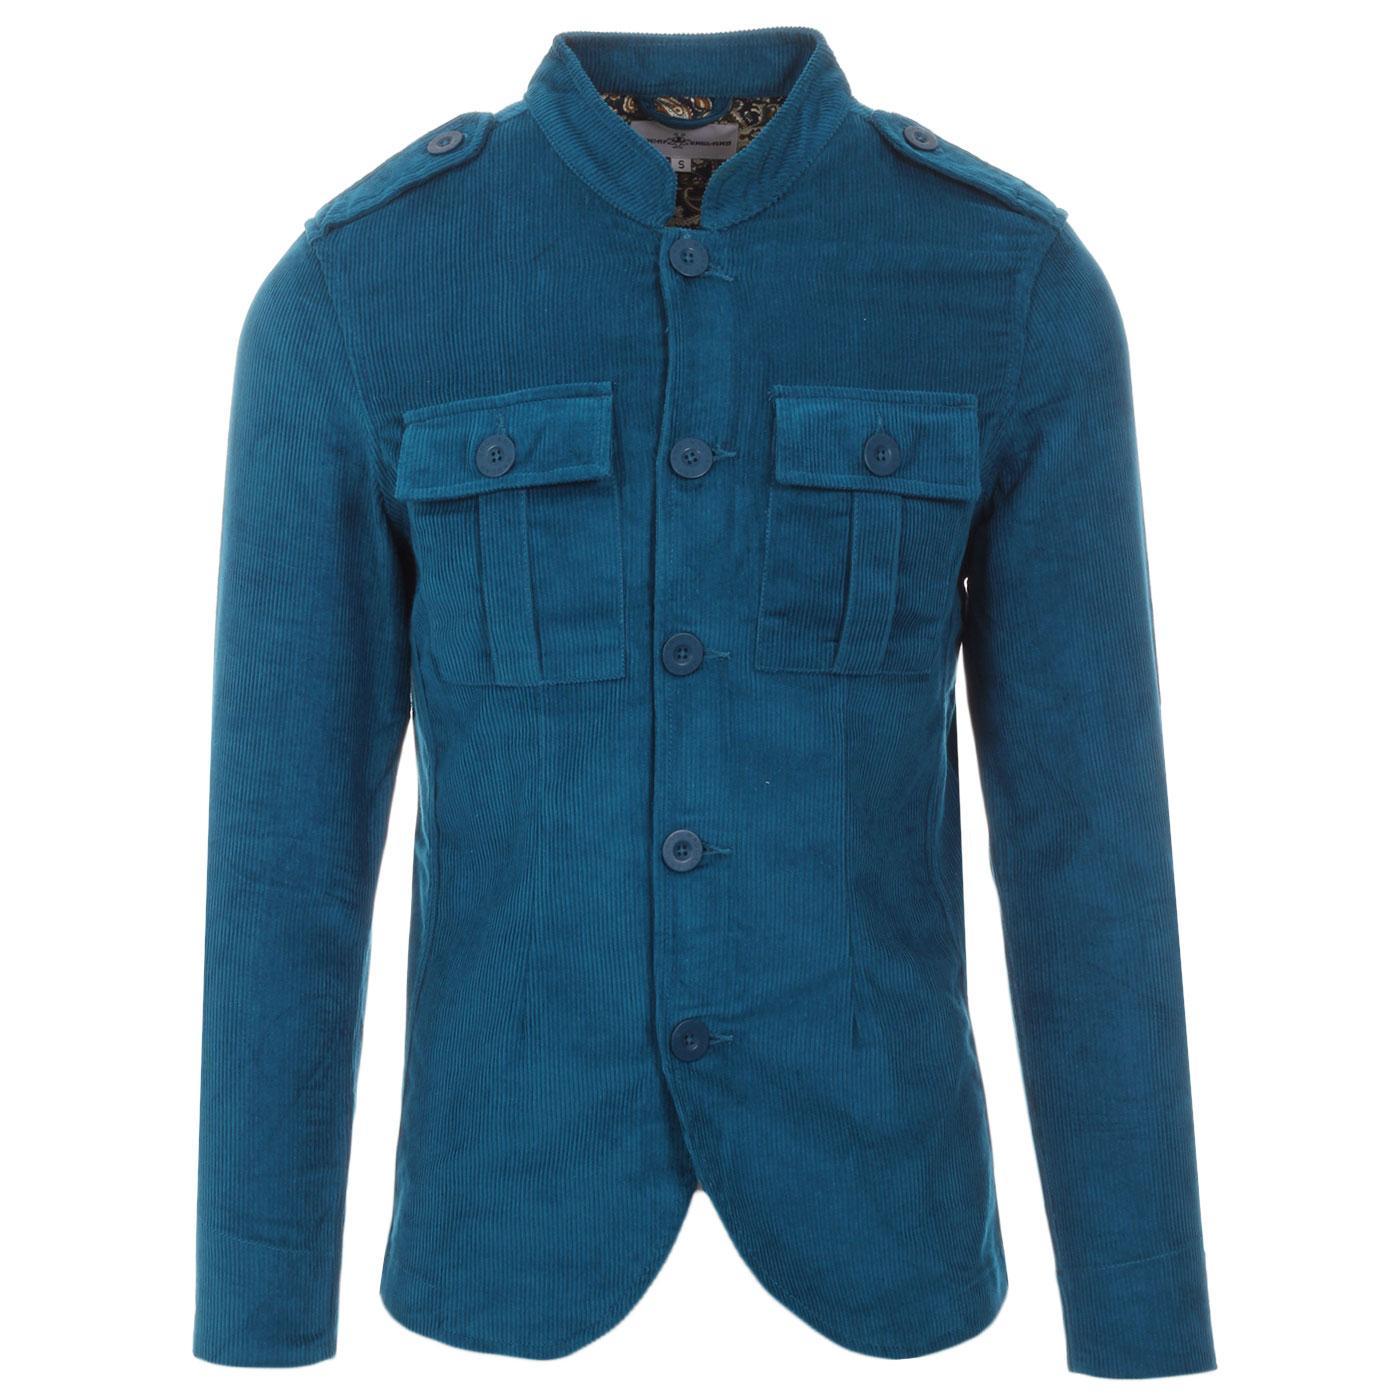 Pepper MADCAP ENGLAND Mod Cord Tunic Jacket (Ink)